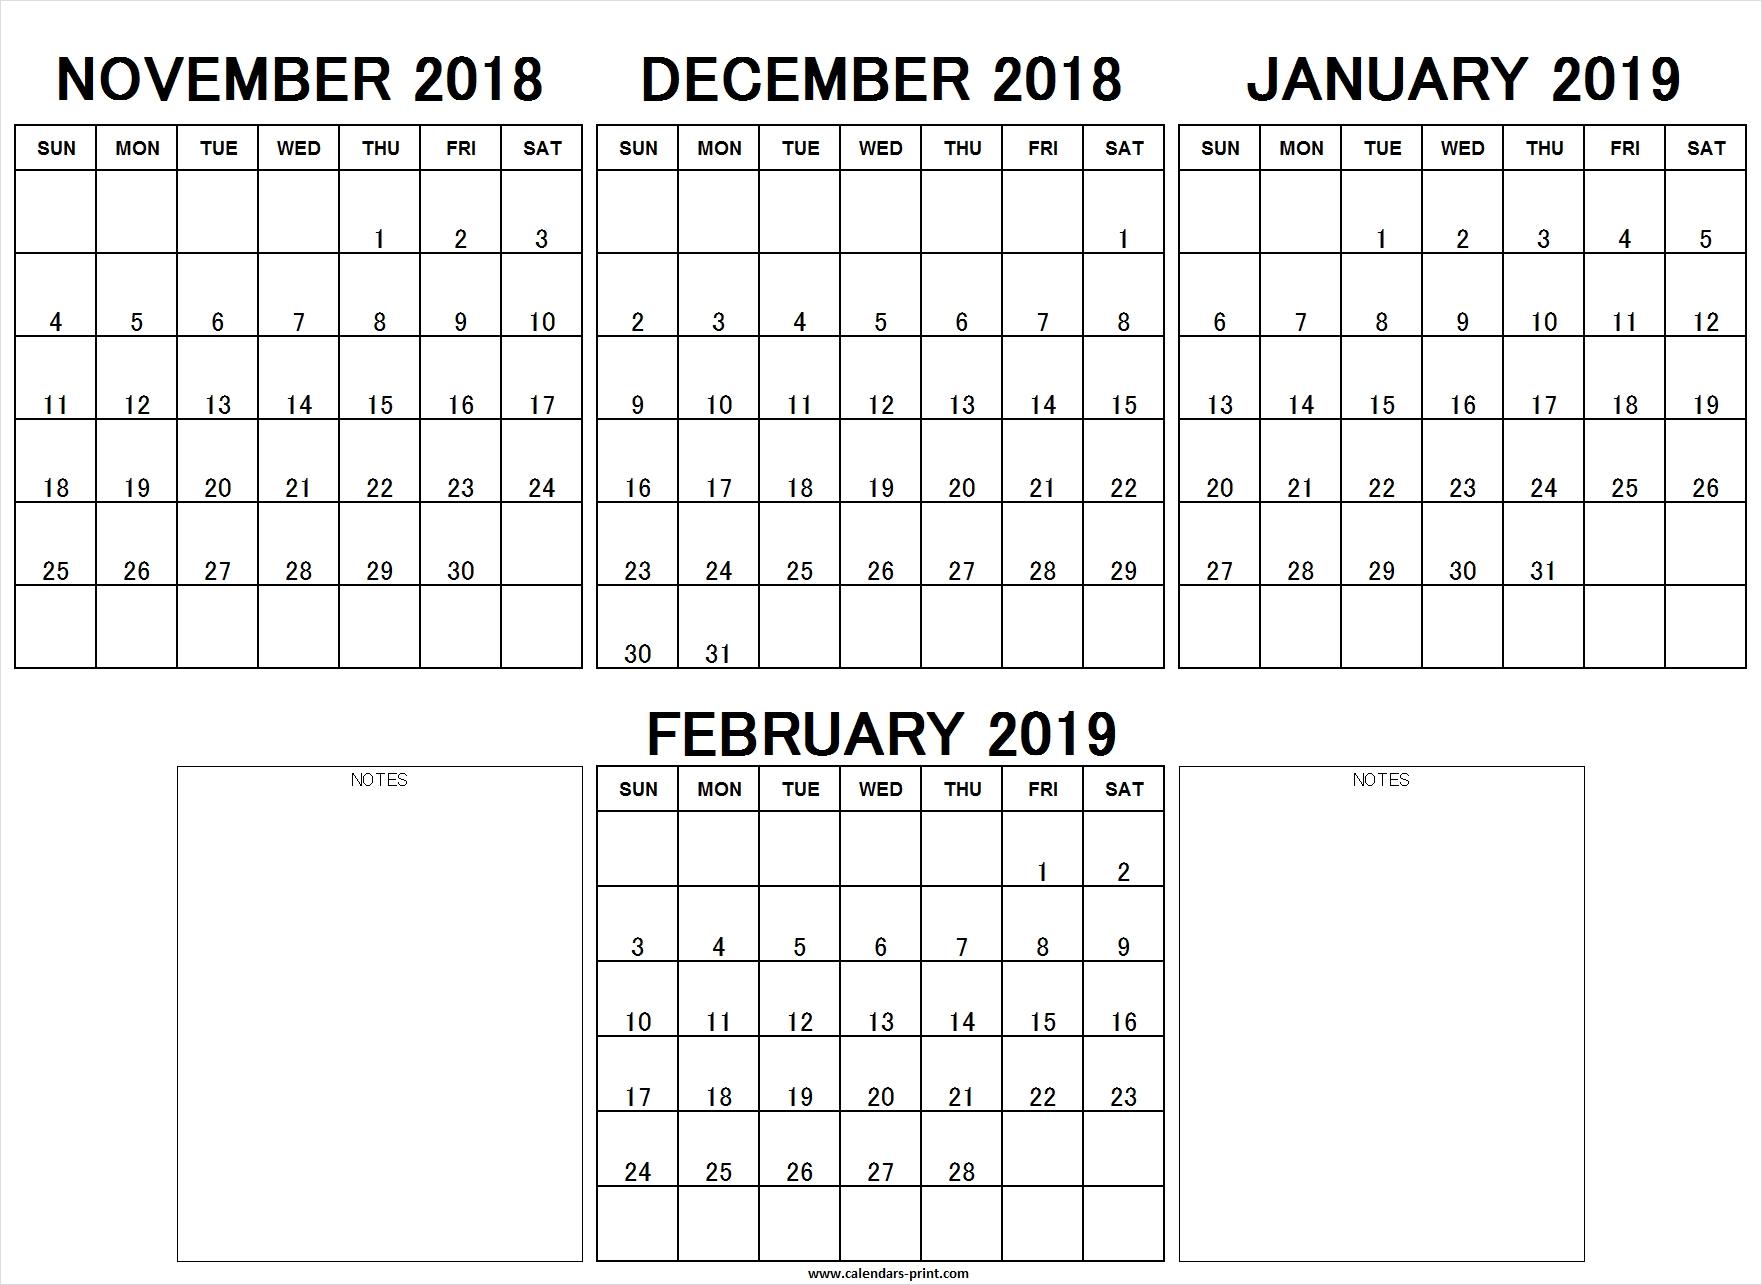 Printable Nov Dec 2018 Jan Feb 2019 Calendar Excel Template Archives throughout Calendar Images From Jan To Dec